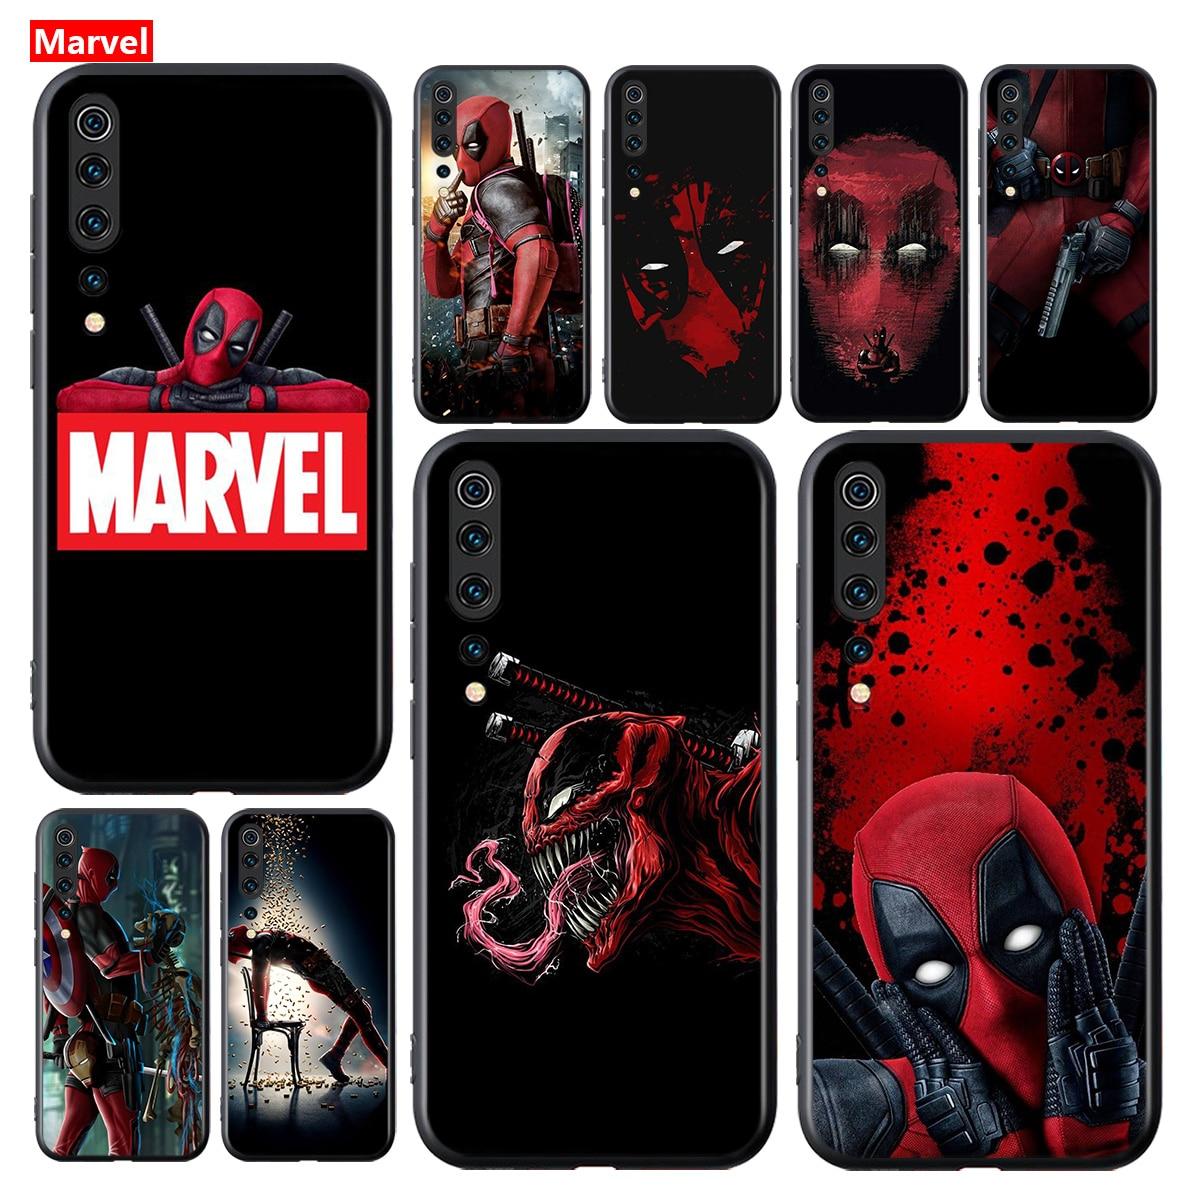 marvel-vengadores-super-heroe-deadpool-para-xiaomi-mi-11-11i-10t-nota-10-9t-9-se-8-lite-ultra-5g-tpu-de-silicona-negro-telefono-caso